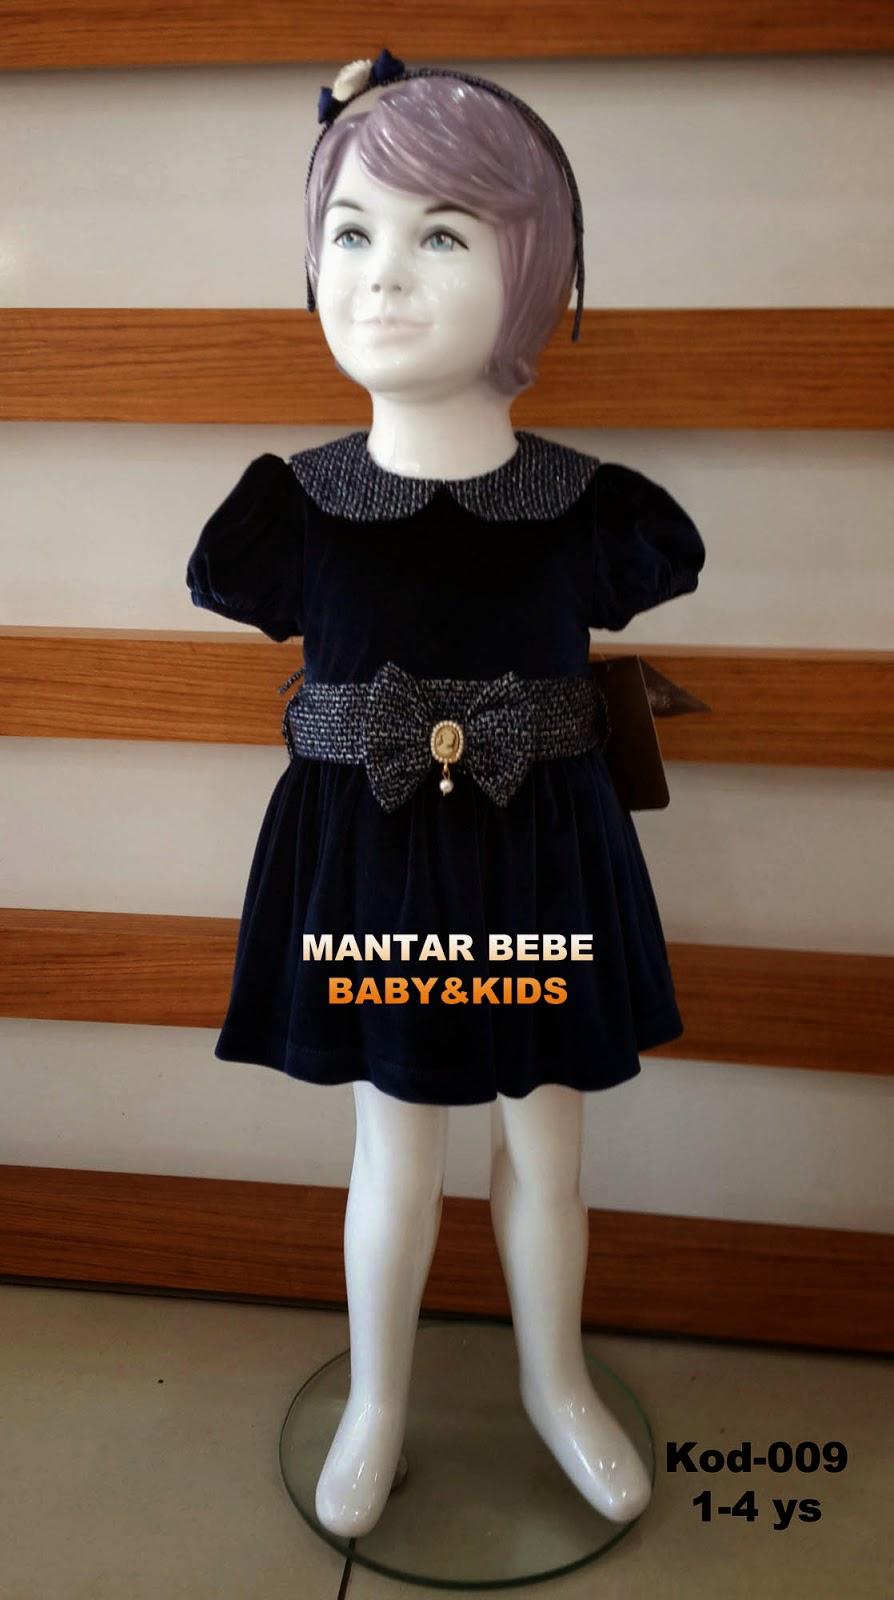 MANTAR BEBE ÇOCUK GİYİM - KOD009